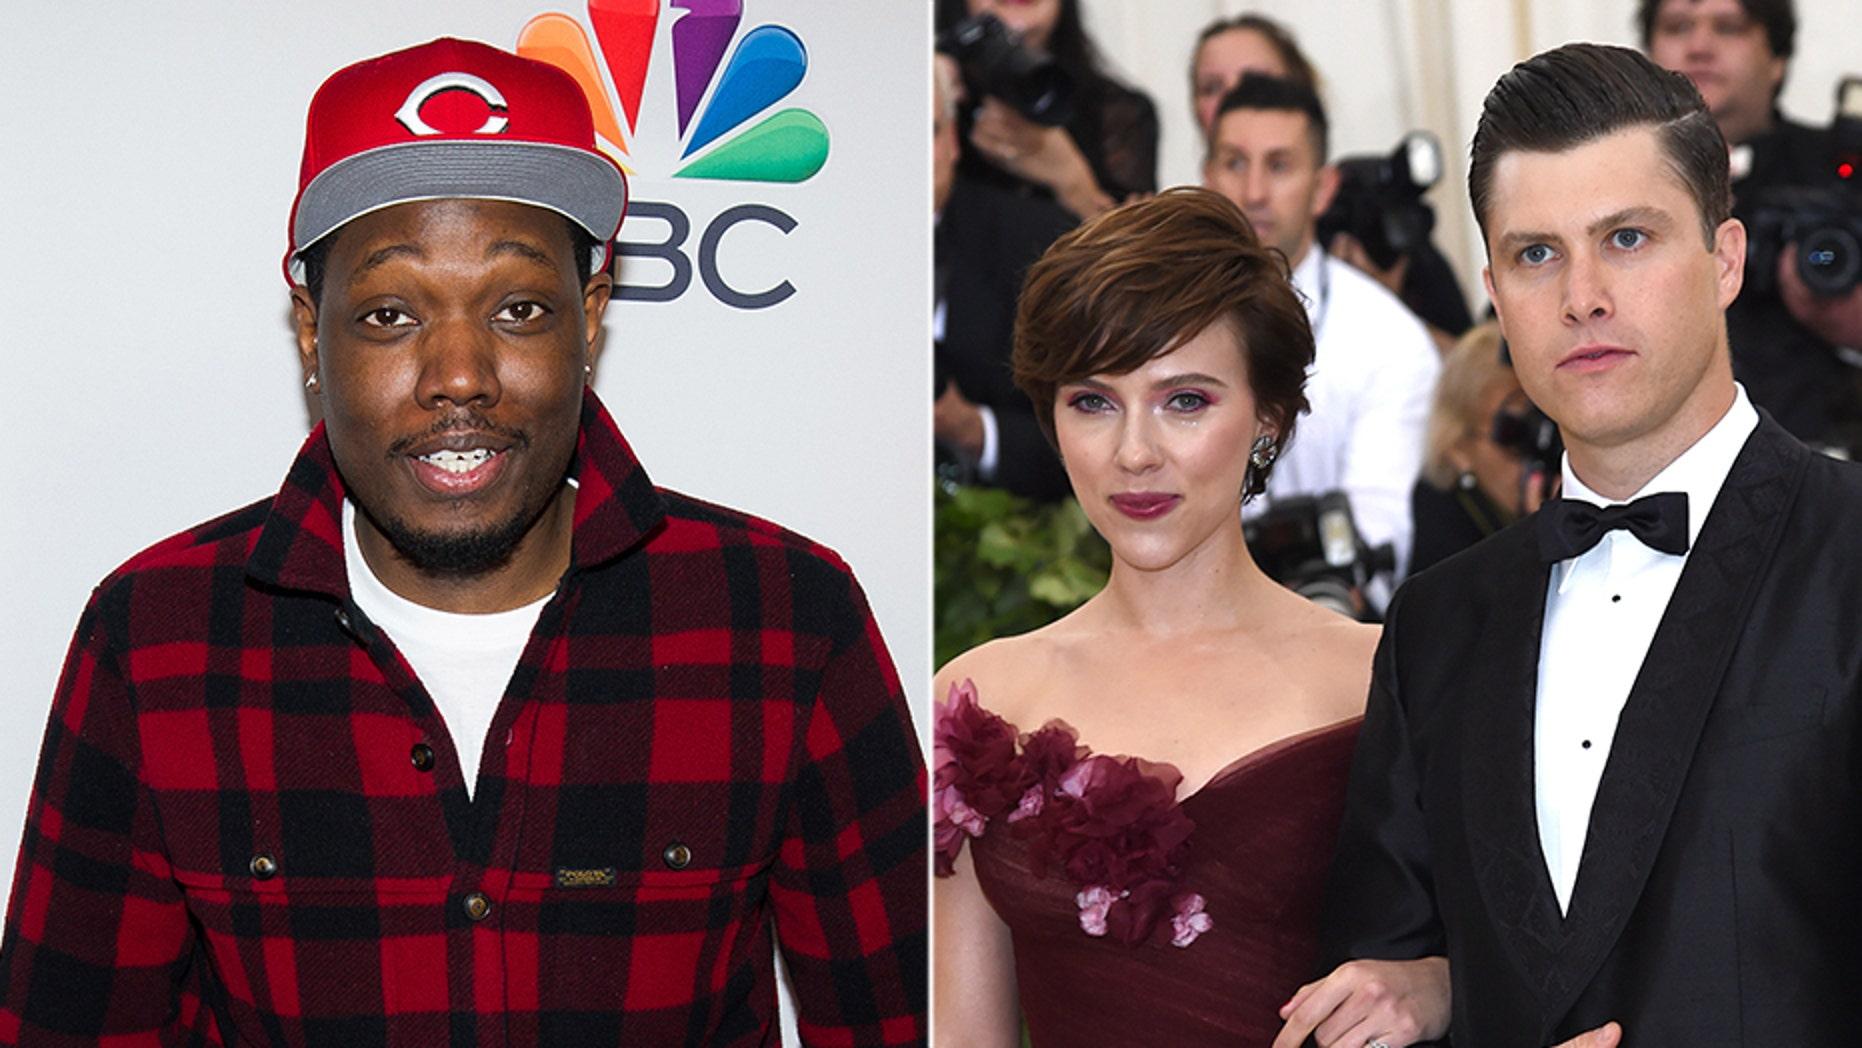 Snl Star Michael Che Surprises Scarlett Johansson Colin Jost With Clown At Intimate Birthday Dinner Fox News